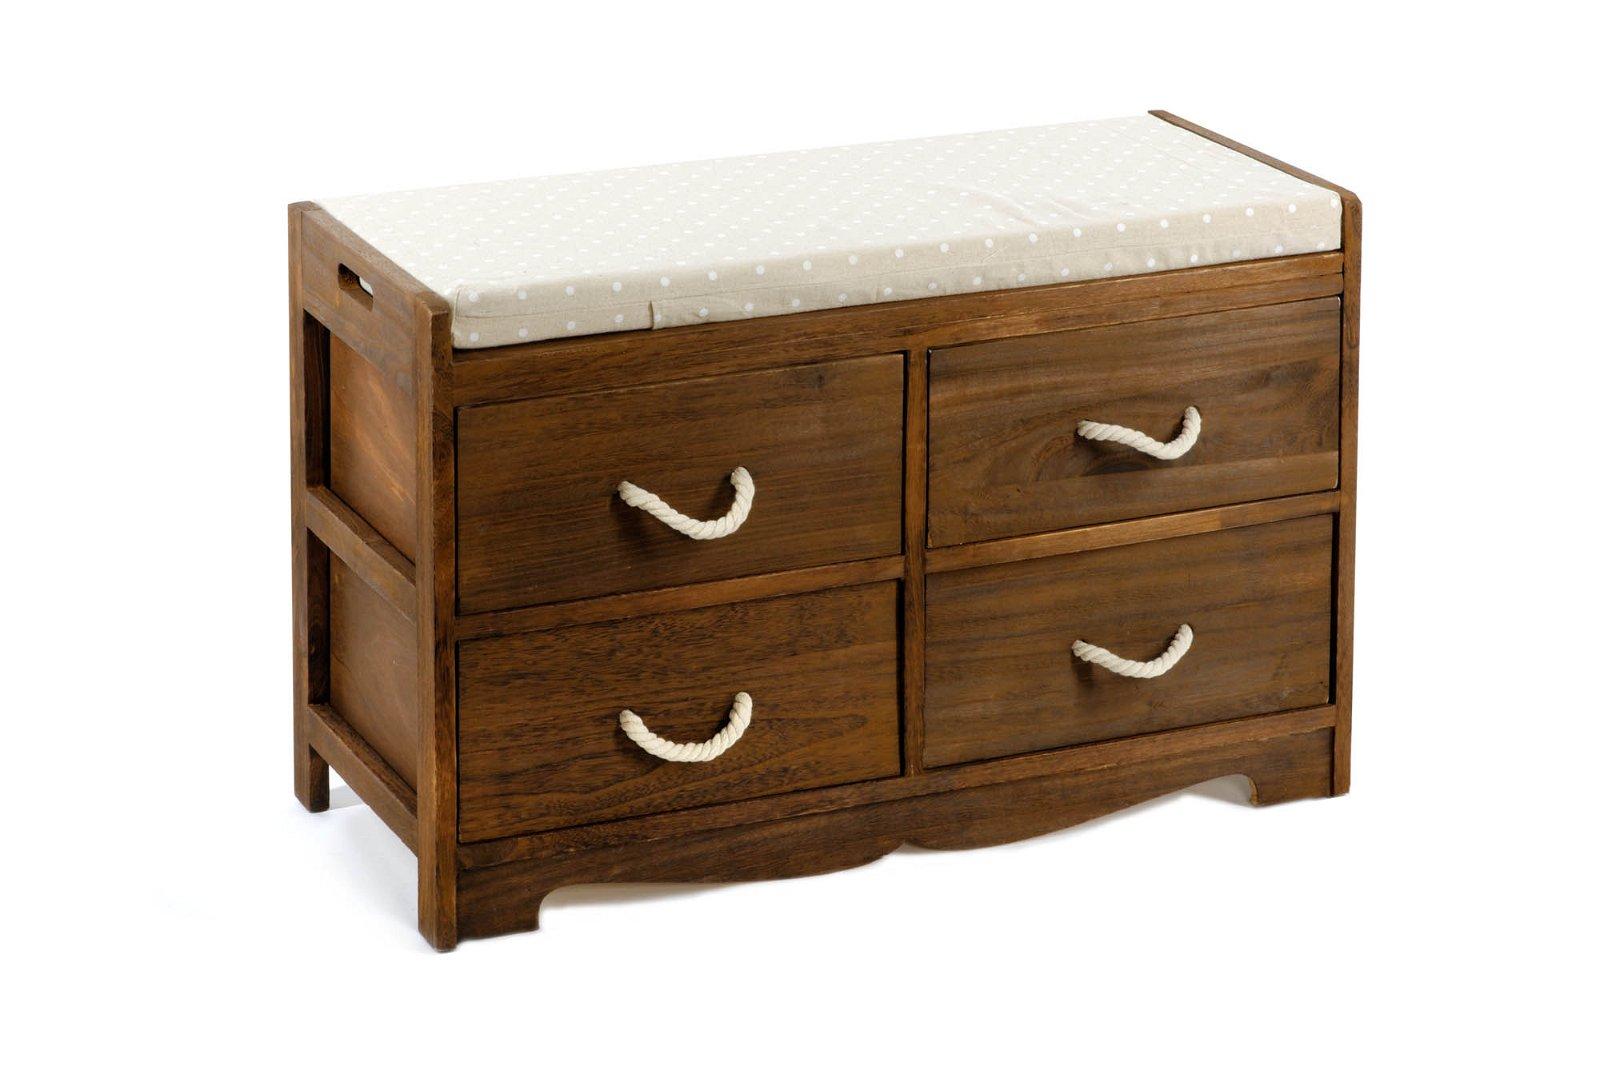 Revesby 4 Drawer Storage Bench 76 x 33 x 51 cm